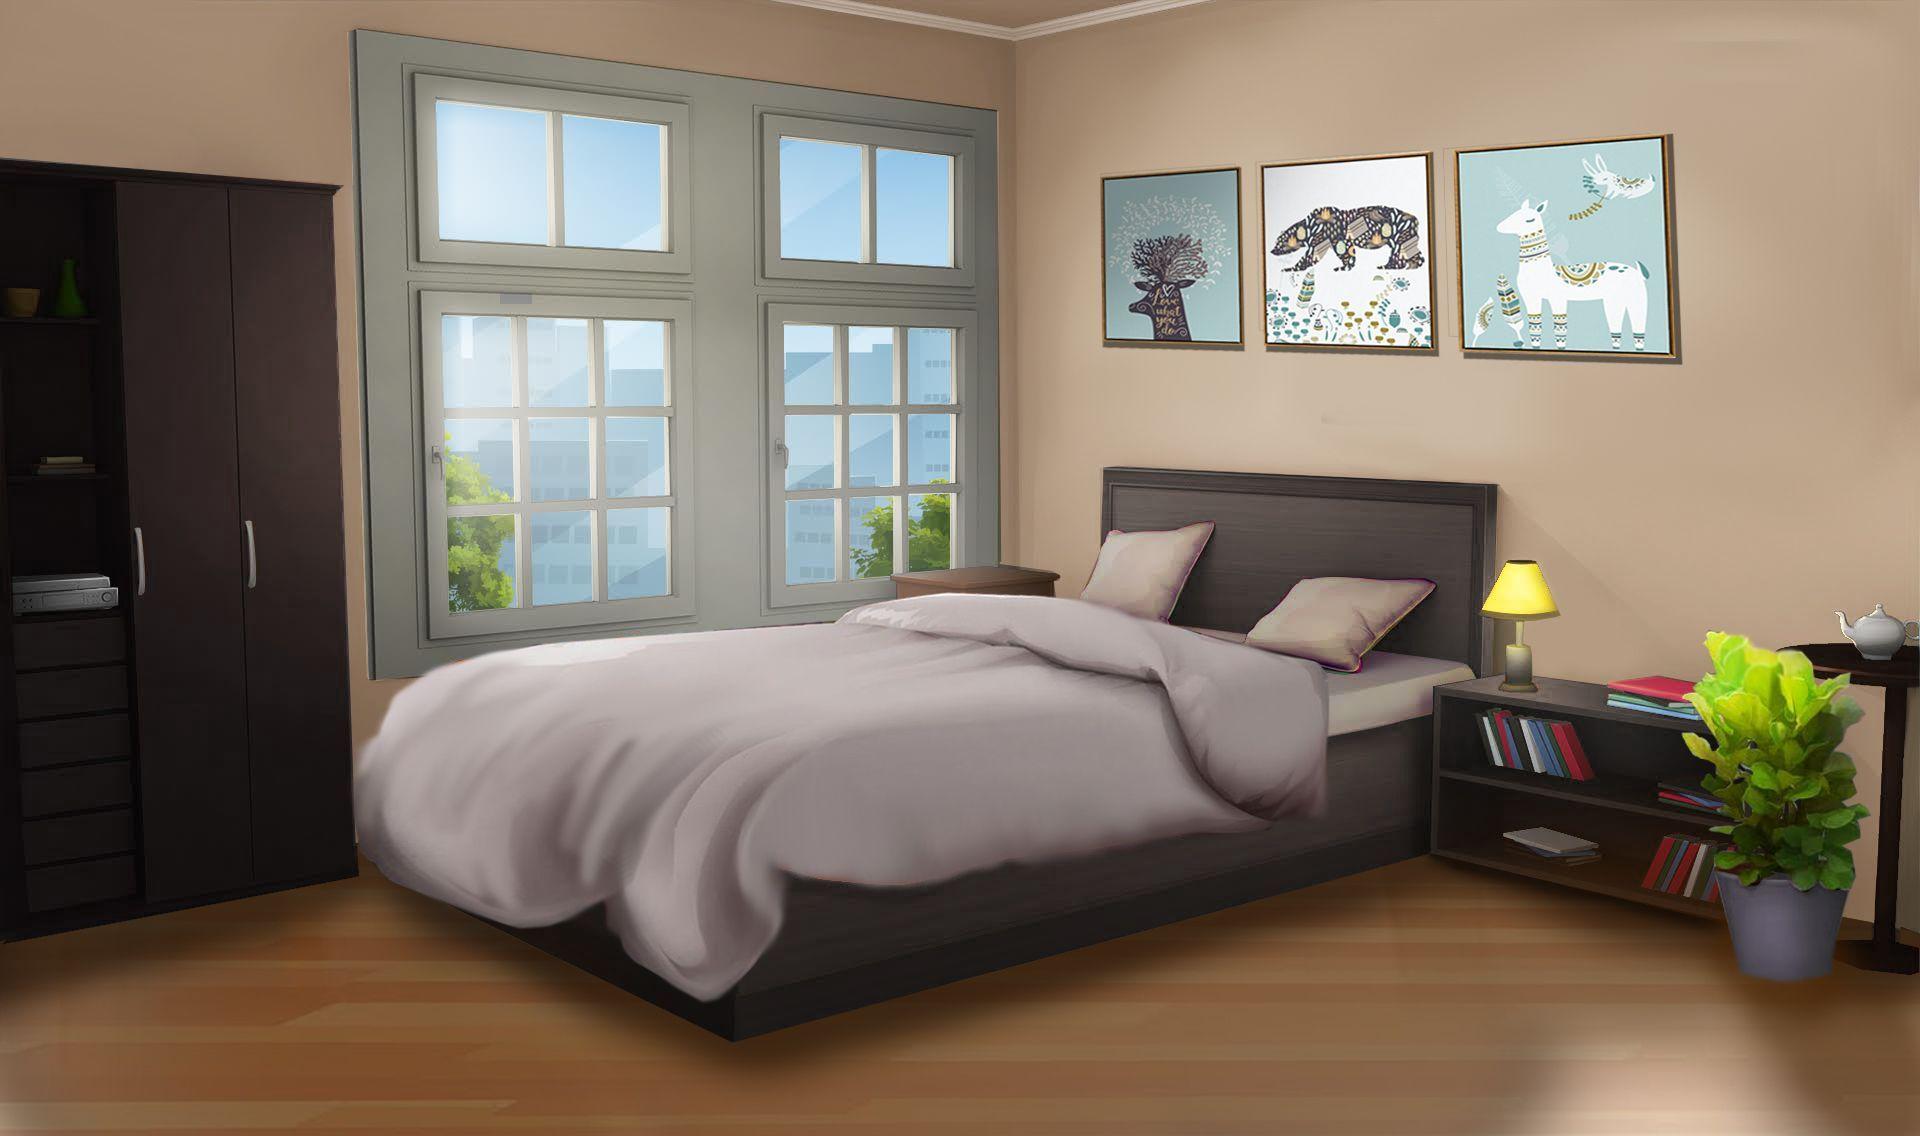 Aesthetic Bedroom Gacha in December 2020